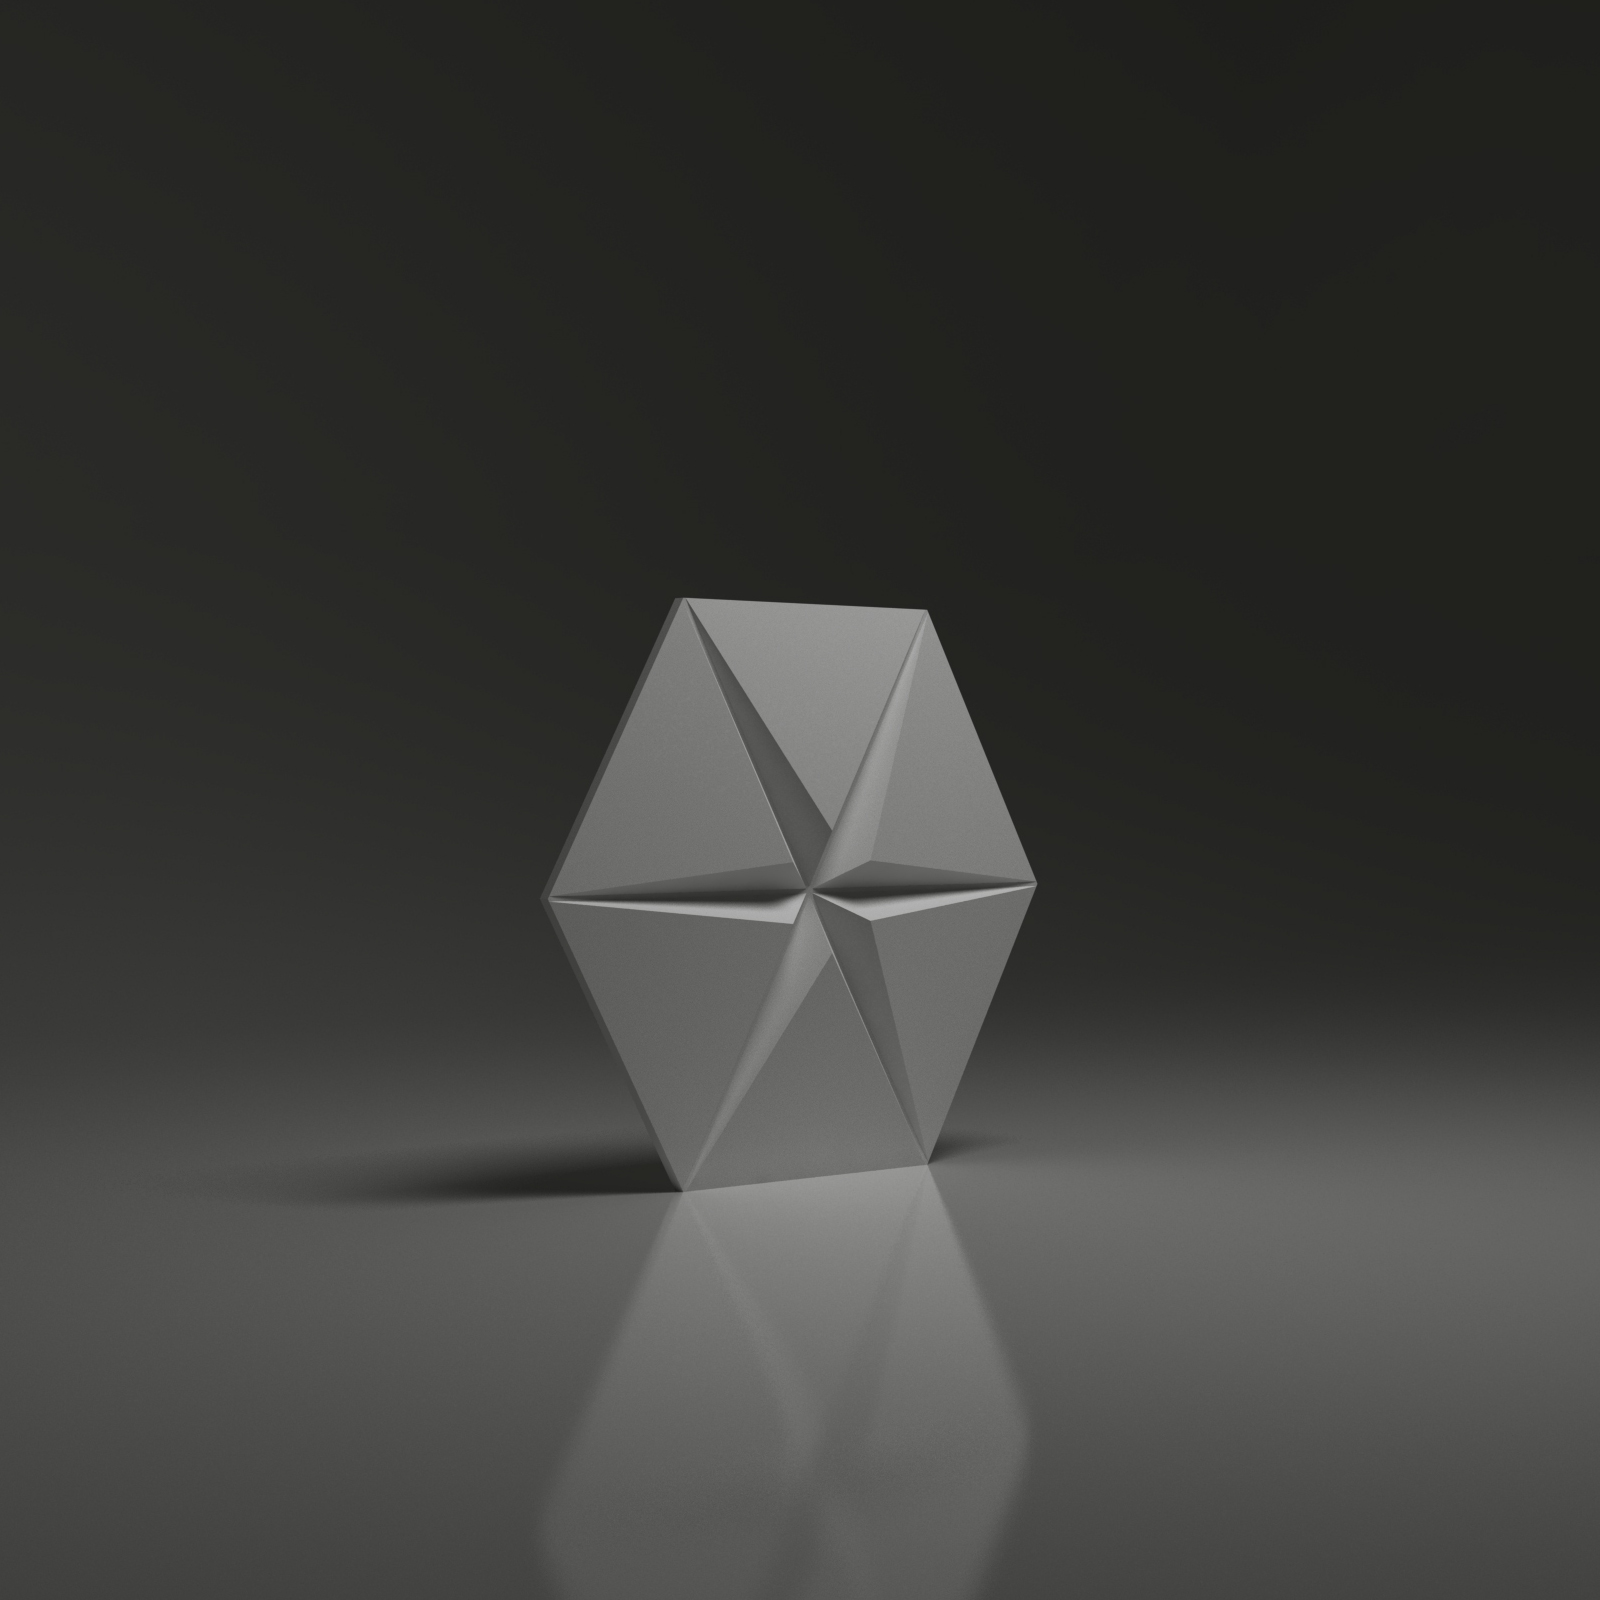 hexagon-stars-wizu